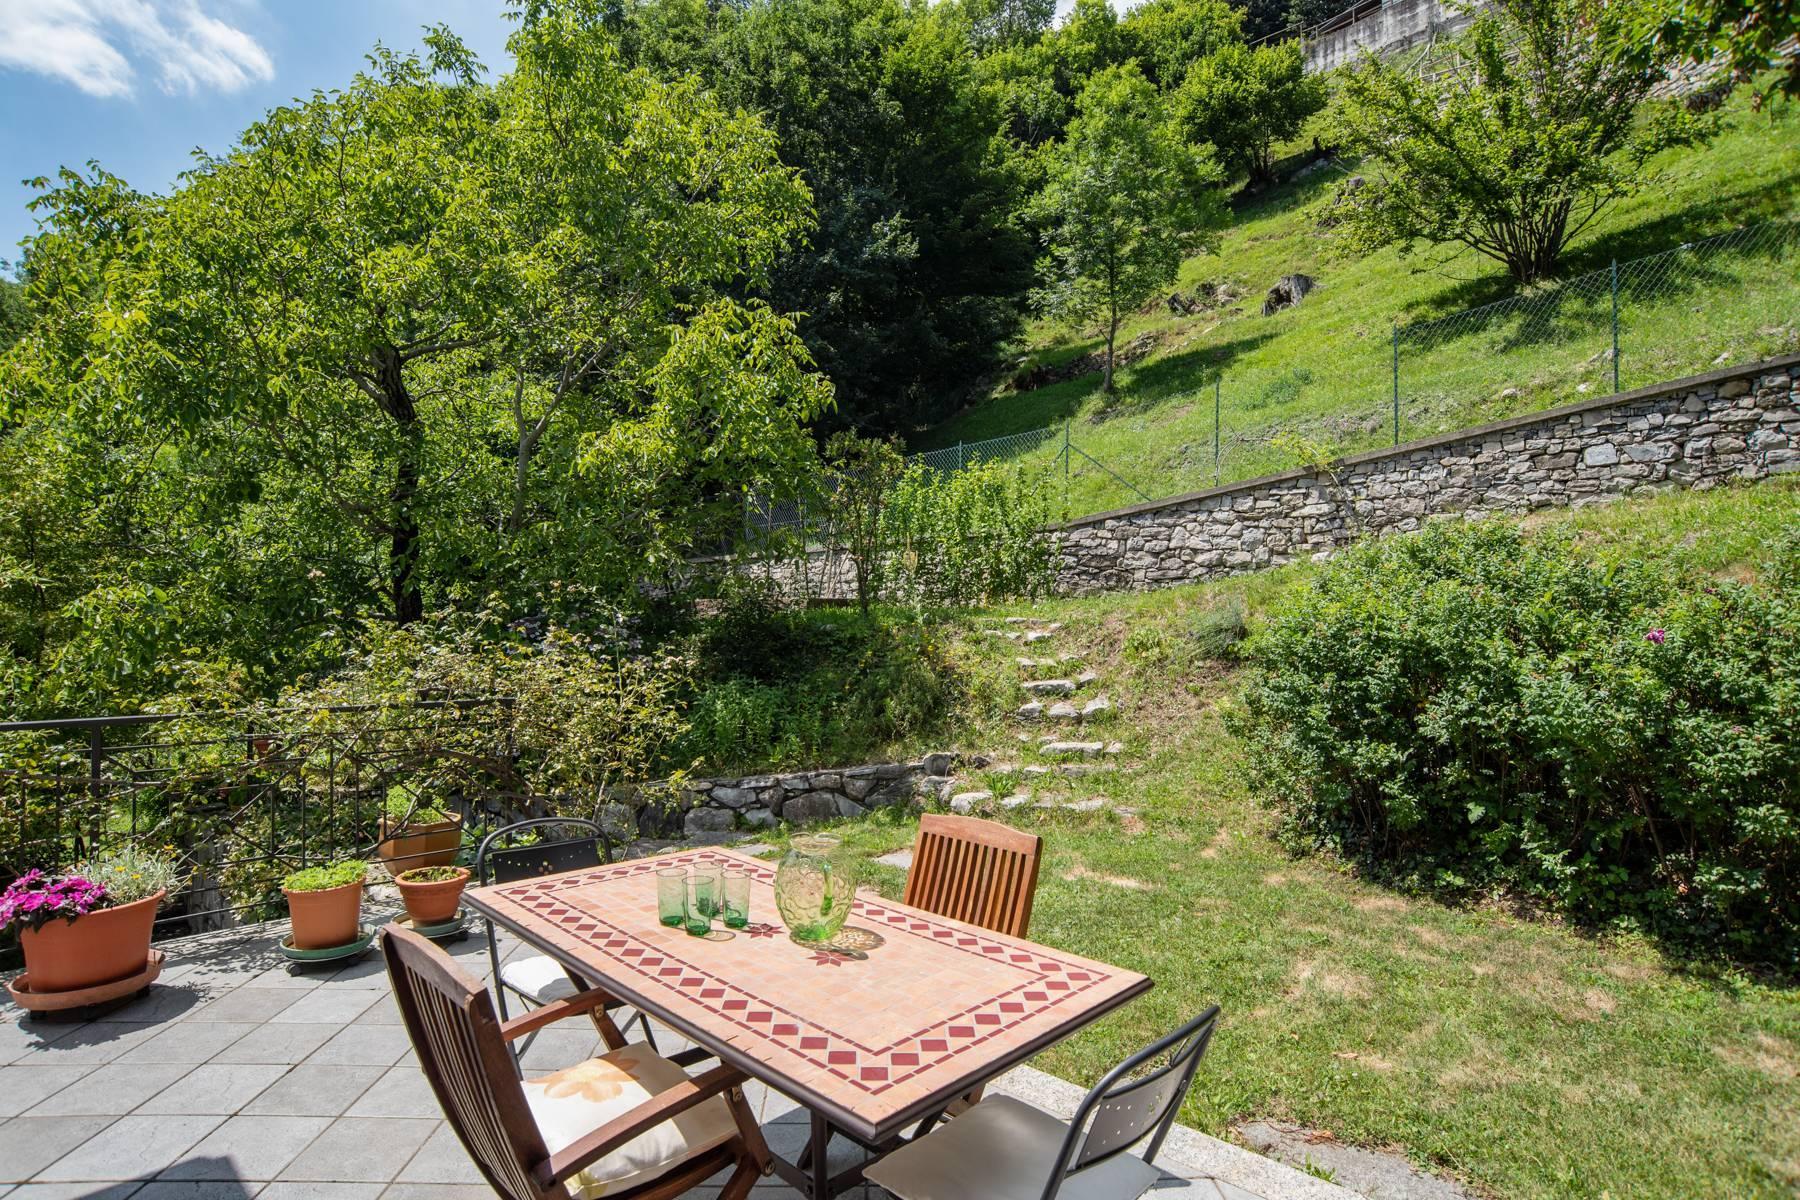 Splendida villa moderna sulla collina soleggiata sopra Argegno - 14